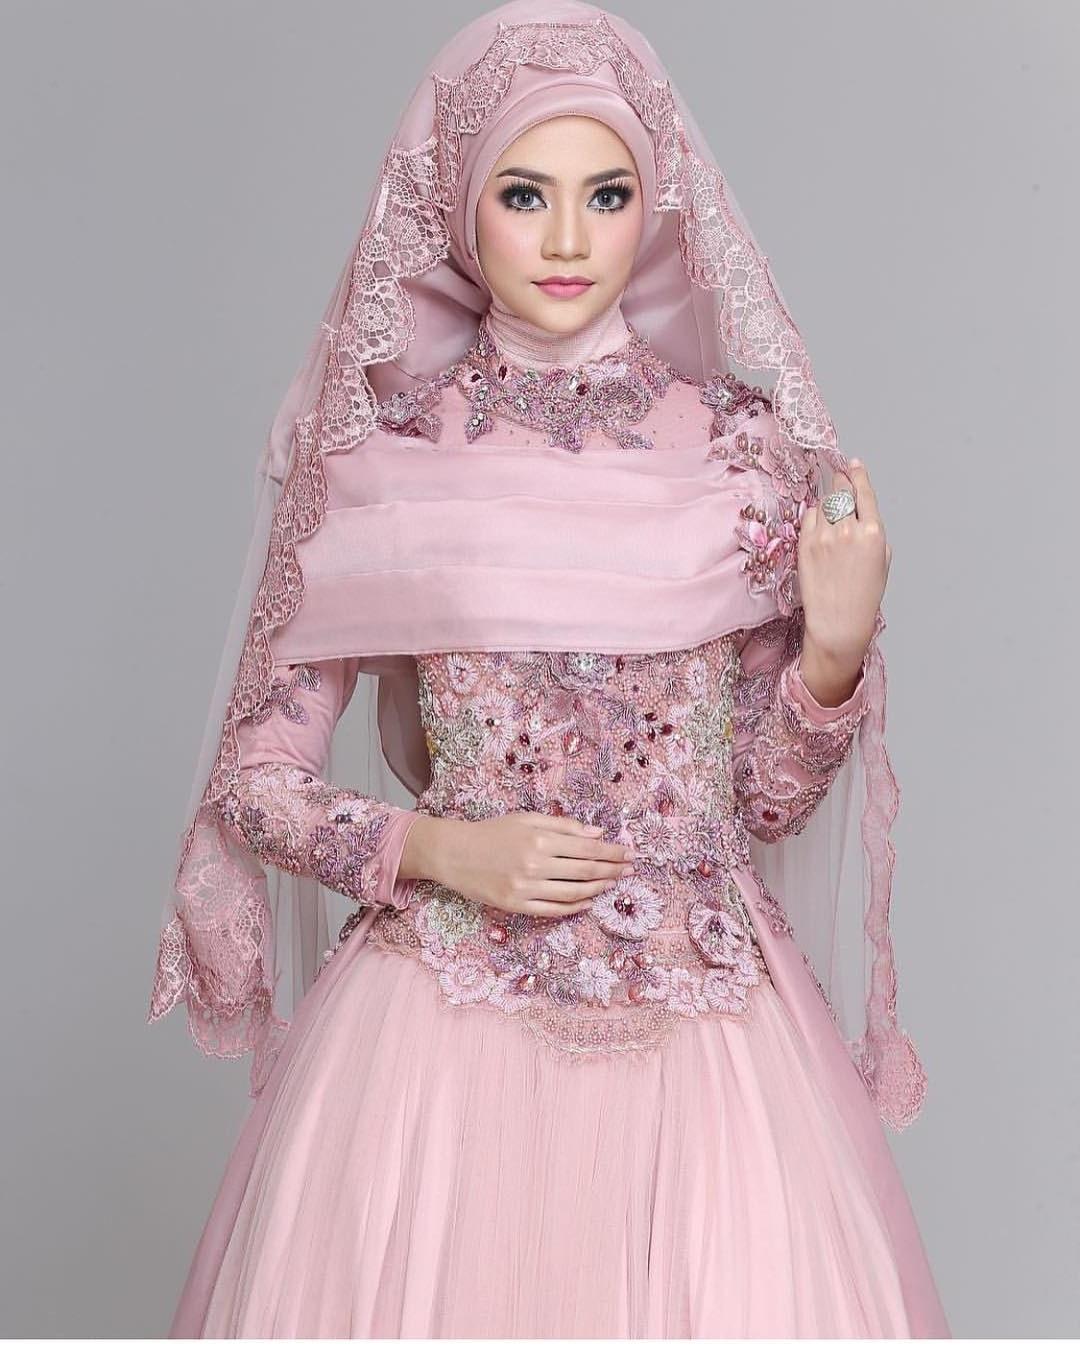 Ide Jual Baju Pengantin Muslimah Syar'i H9d9 30 Model Baju Gamis Pengantin Muslimah Fashion Modern